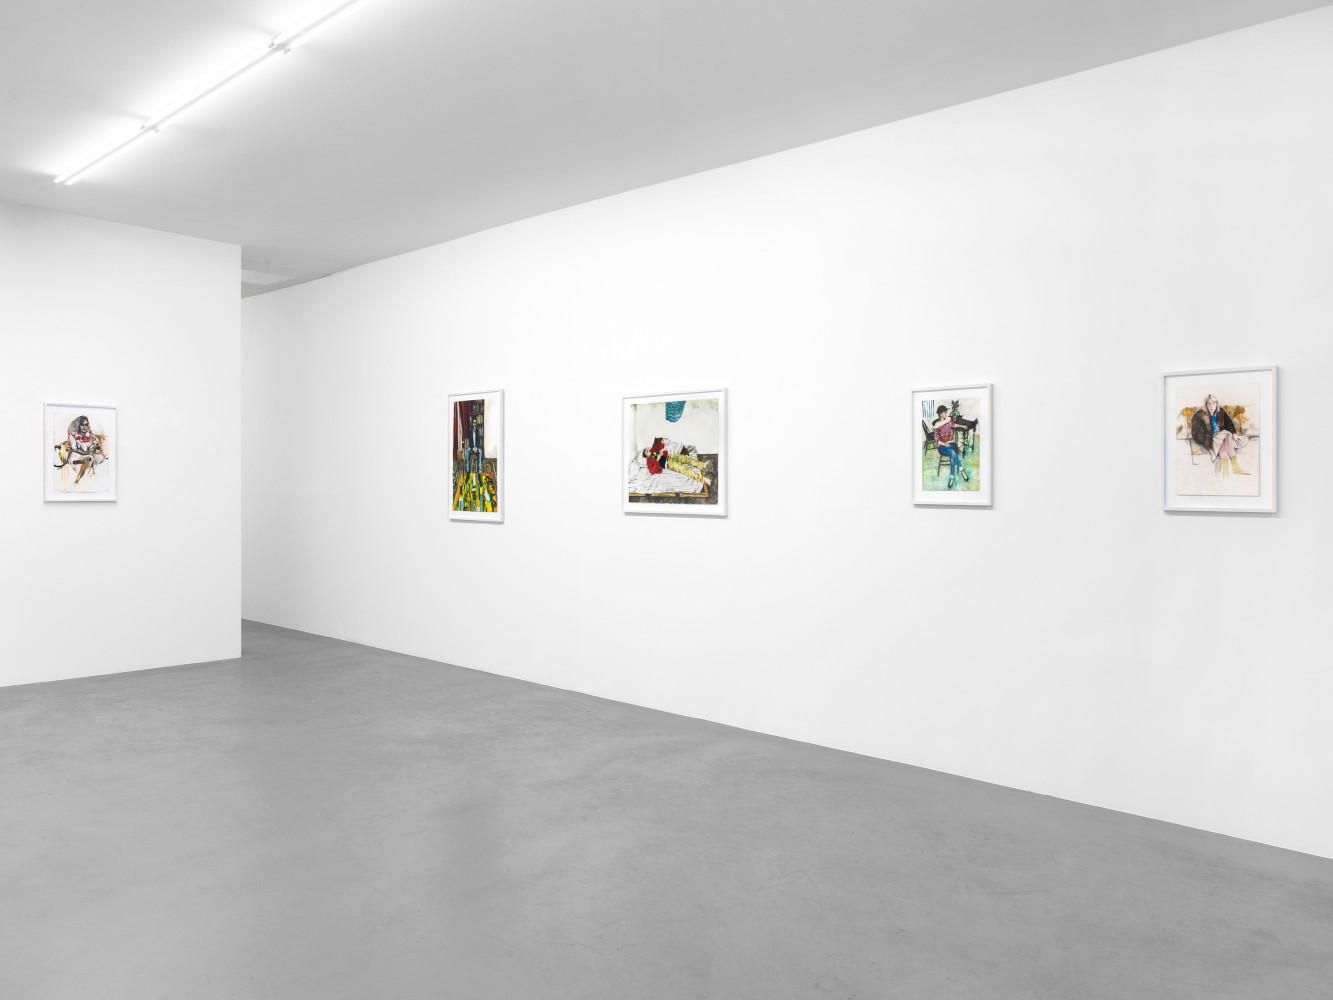 Raffi Kalenderian, Installation view, Buchmann Box, 2014